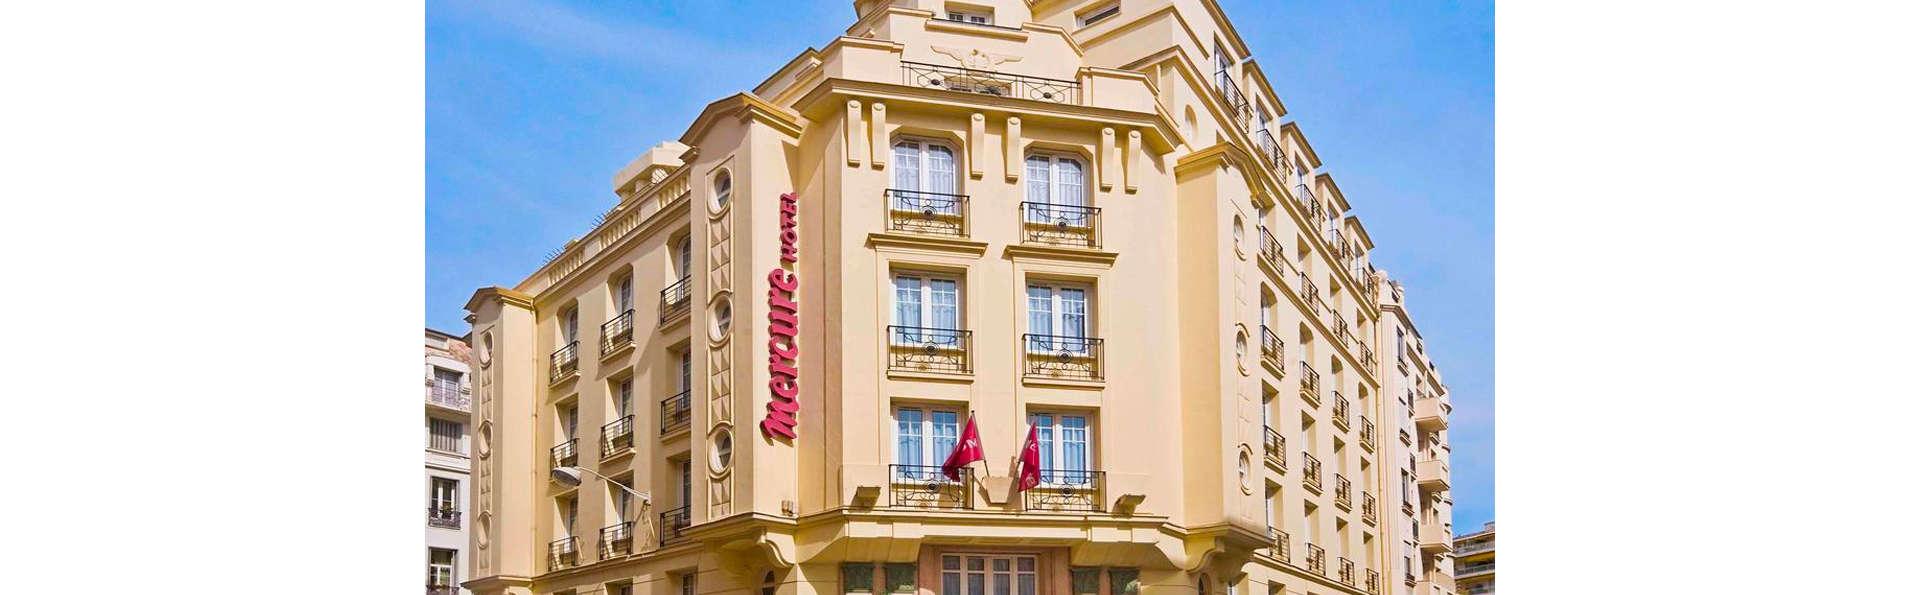 Hôtel Mercure Nice Centre Grimaldi - EDIT_FRONT_01.jpg